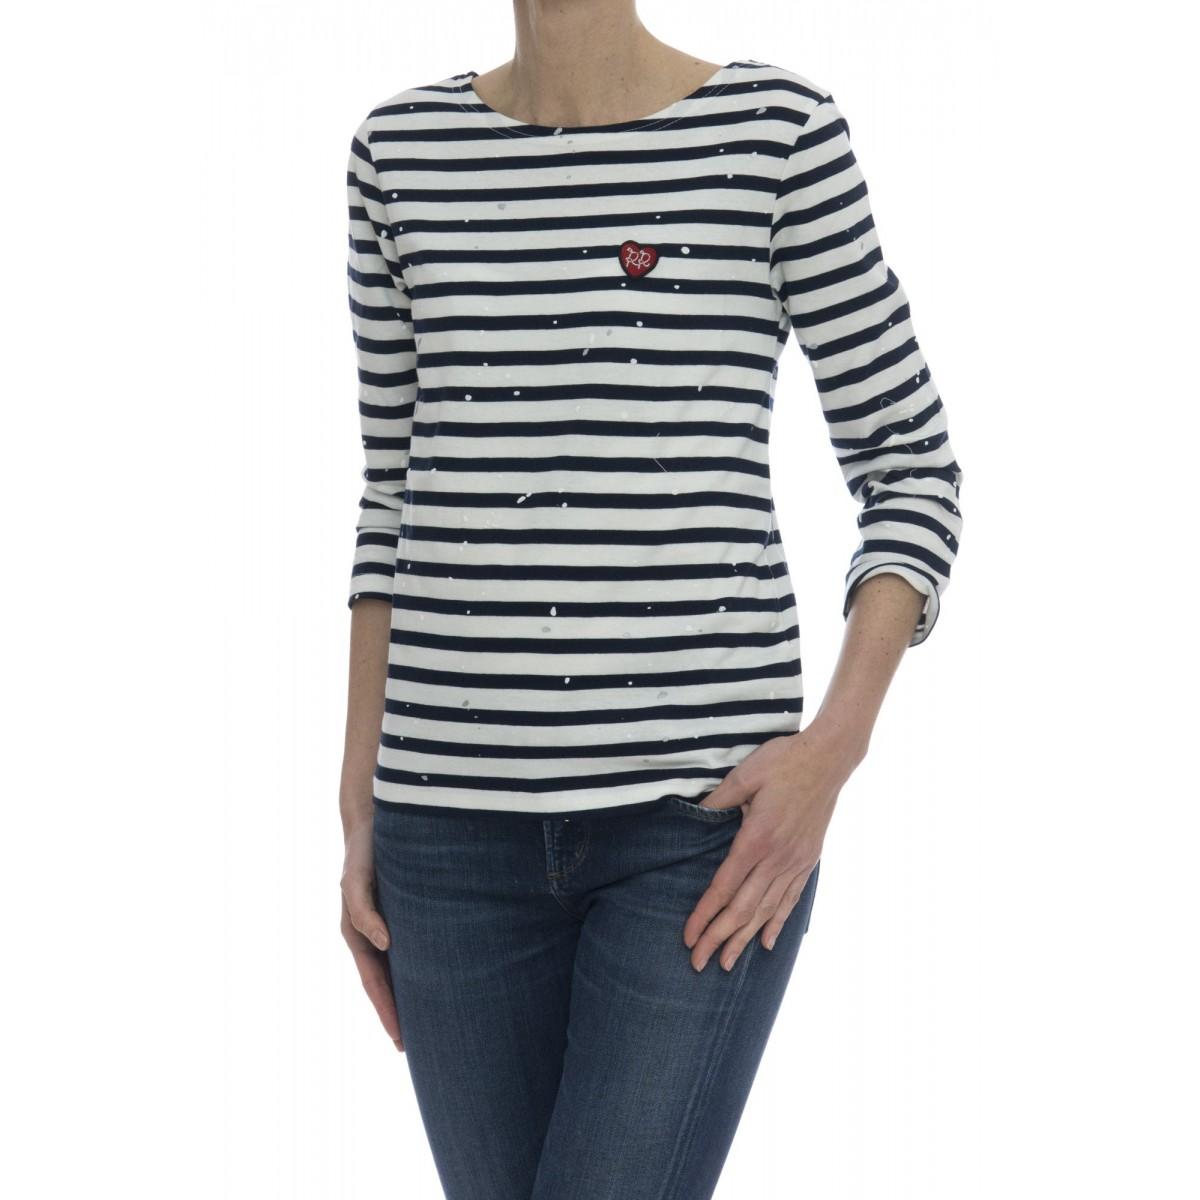 T-shirt donna - Paint silver t-shirt barca